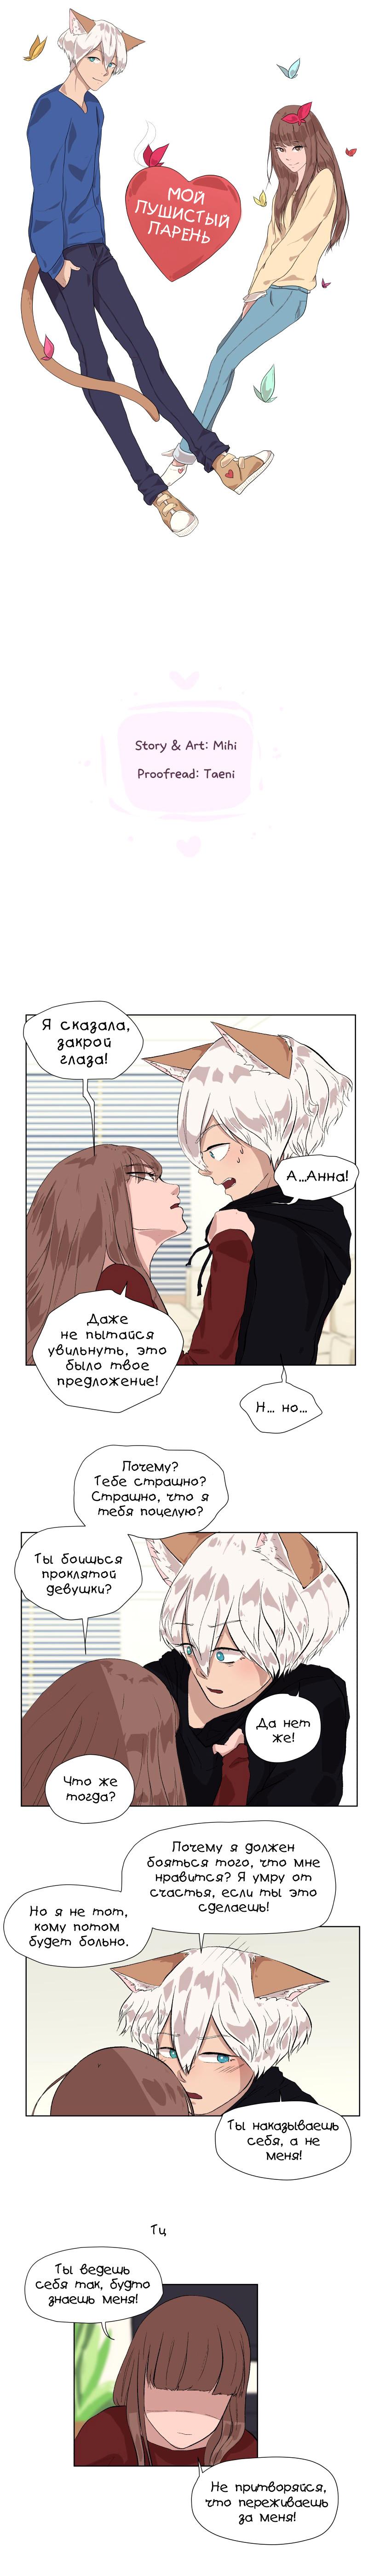 https://r1.ninemanga.com/comics/pic2/58/31802/319481/1488298002216.jpg Page 1